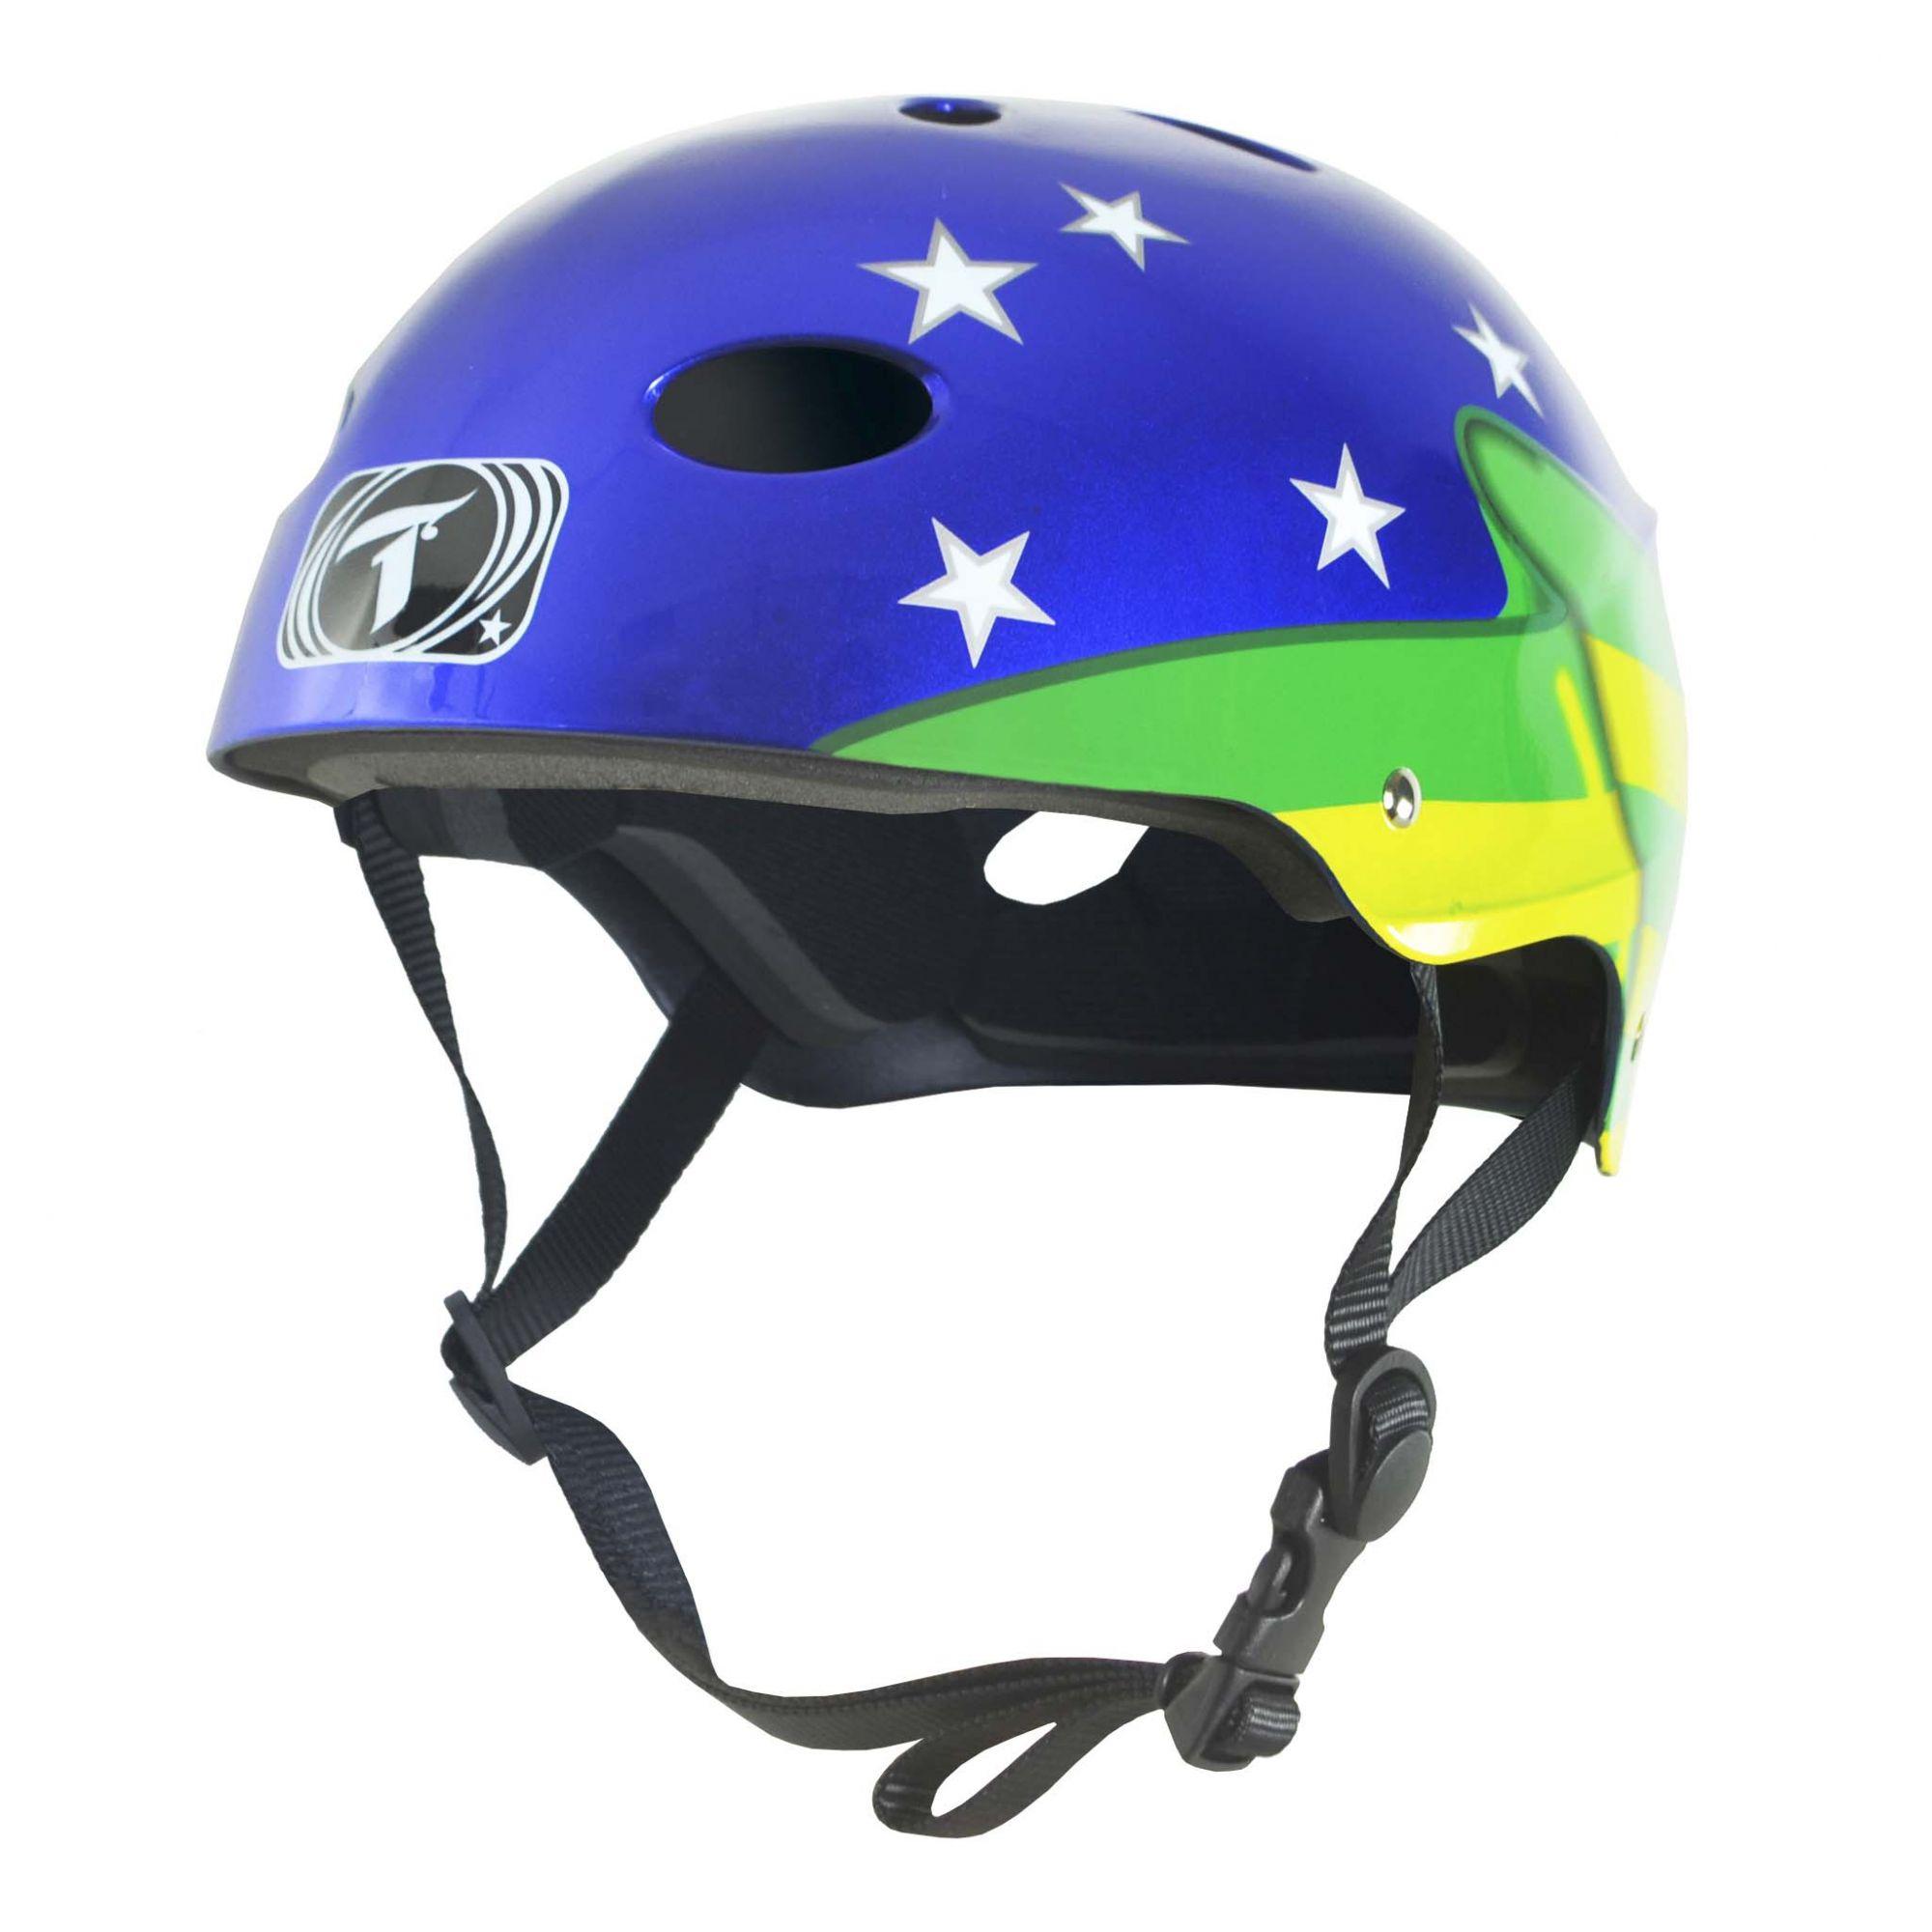 Capacete Esportivo Profissional Brazil Flag  Para Esportes Skate / Patins / Bike - Traxart